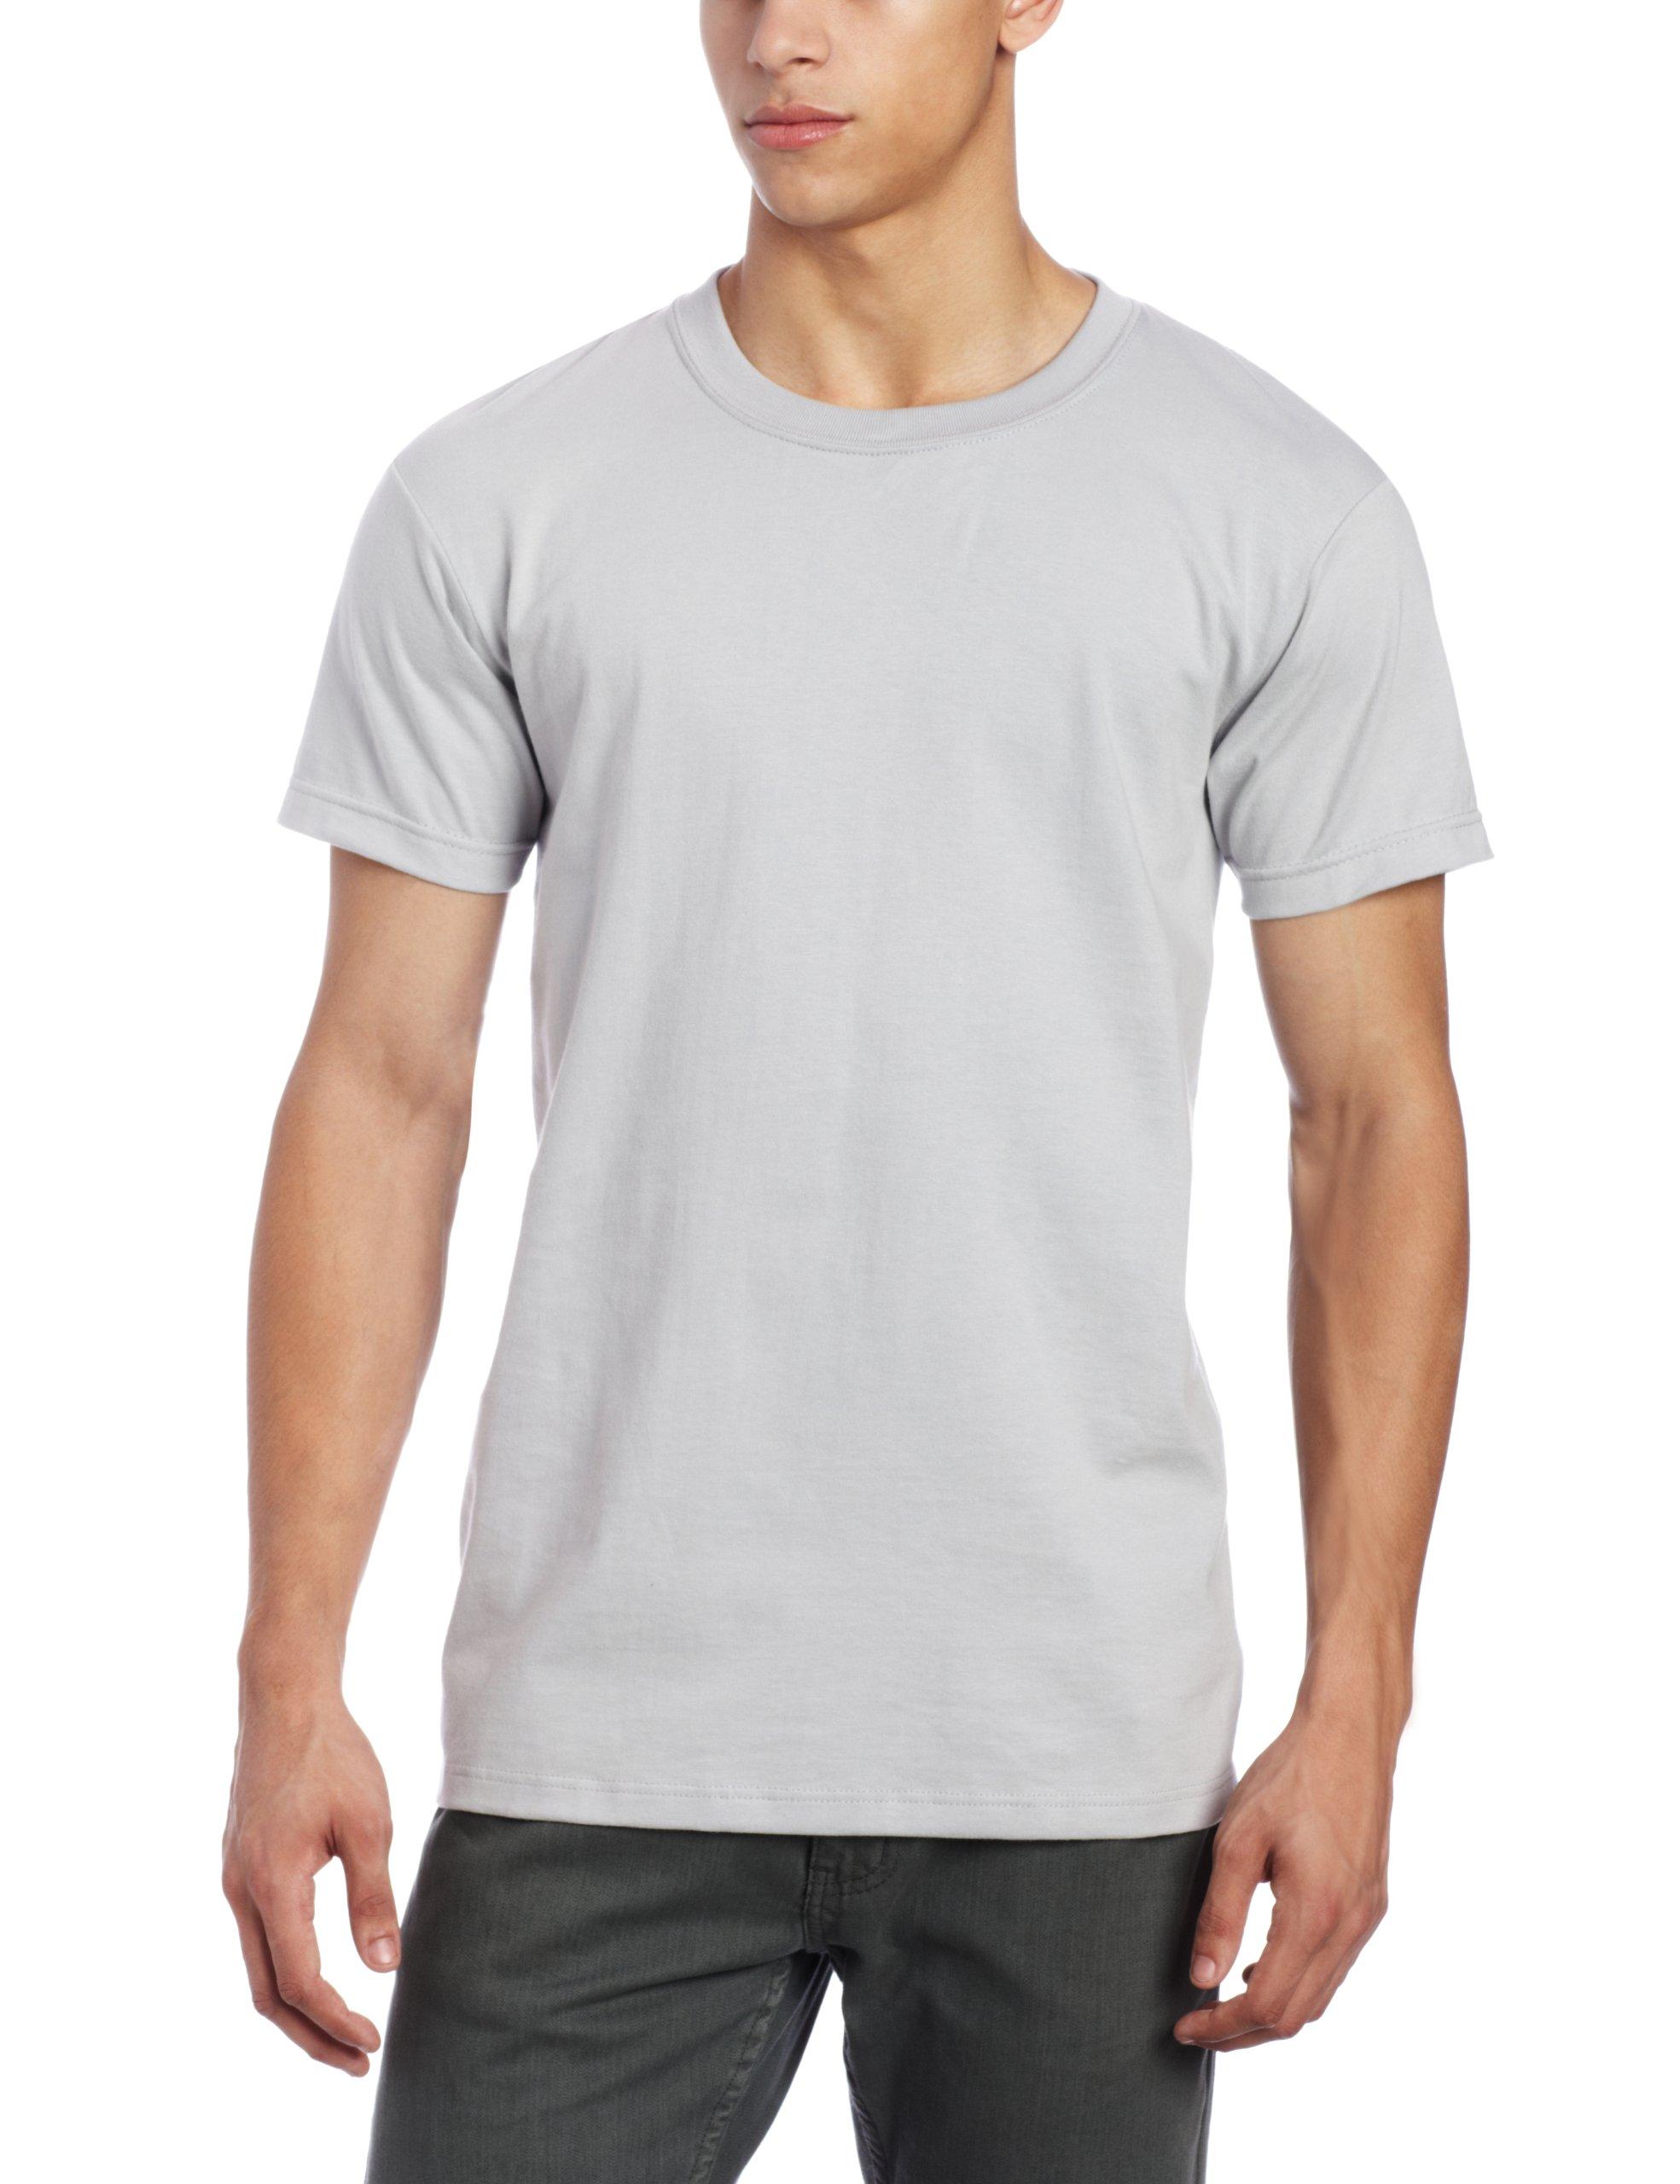 Naked & Famous Denim Men's T-Shirt, Grey Ringspun Cotton, Large